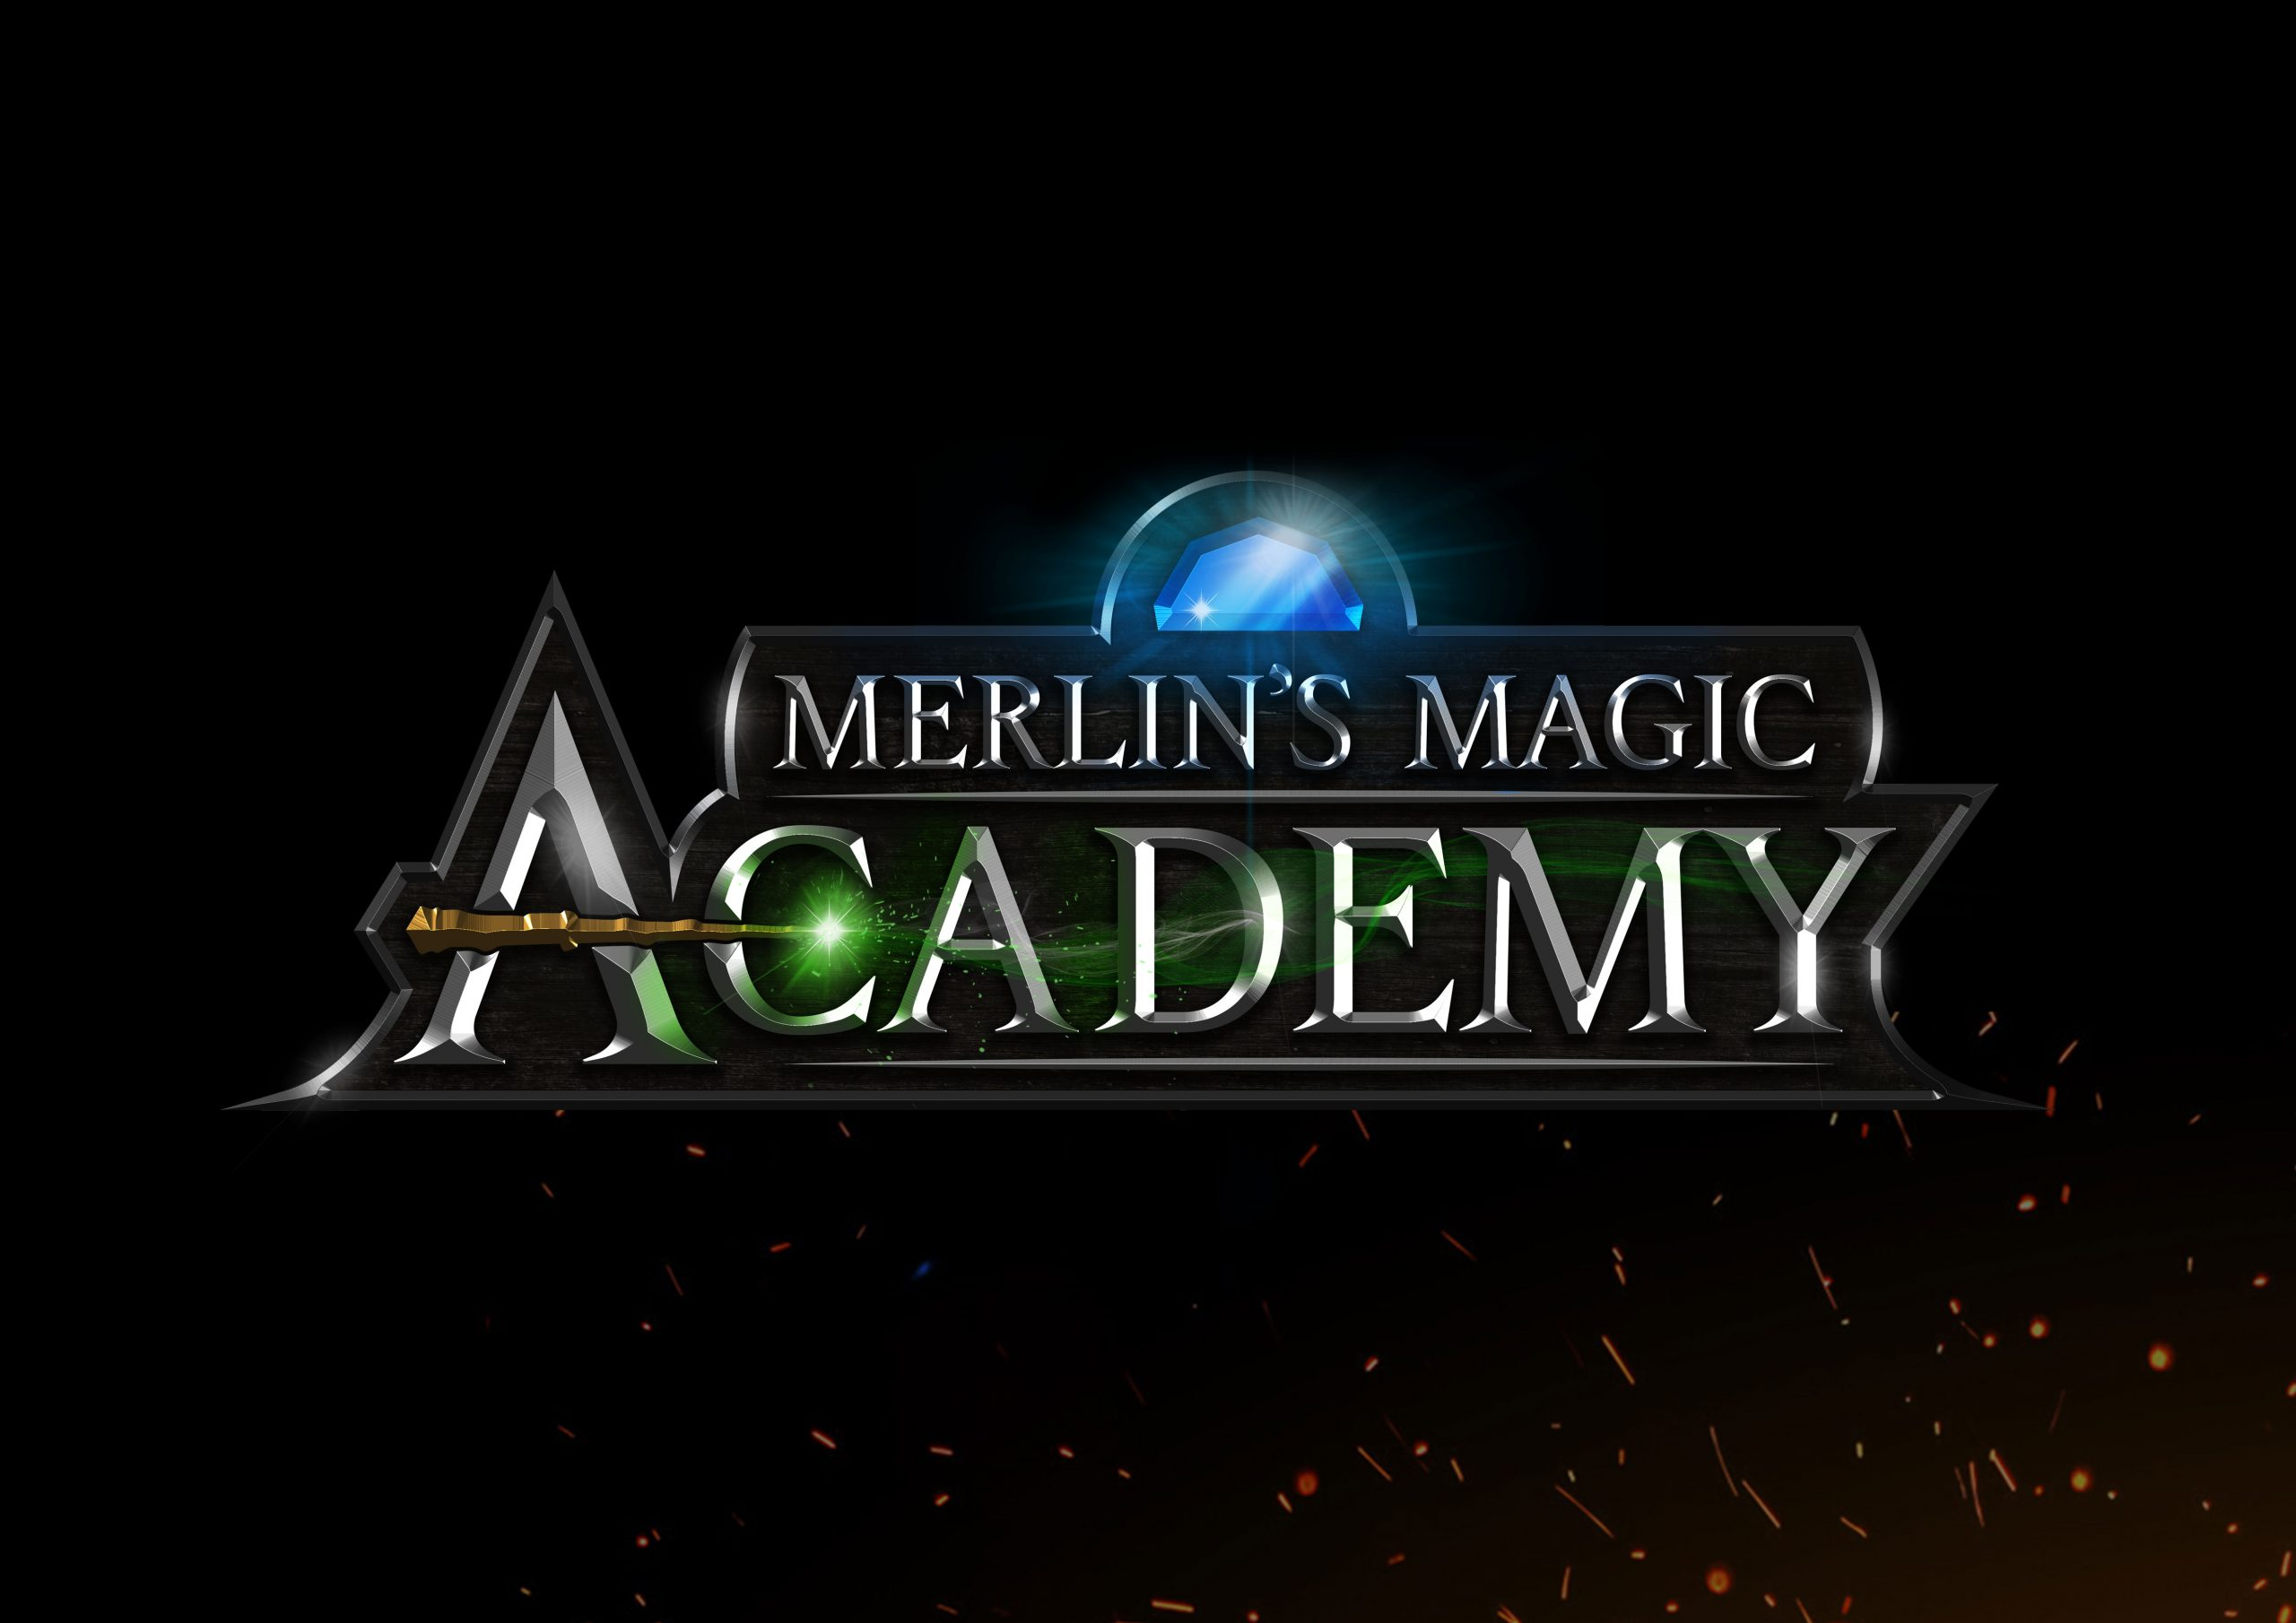 Merlin's Magic Academy